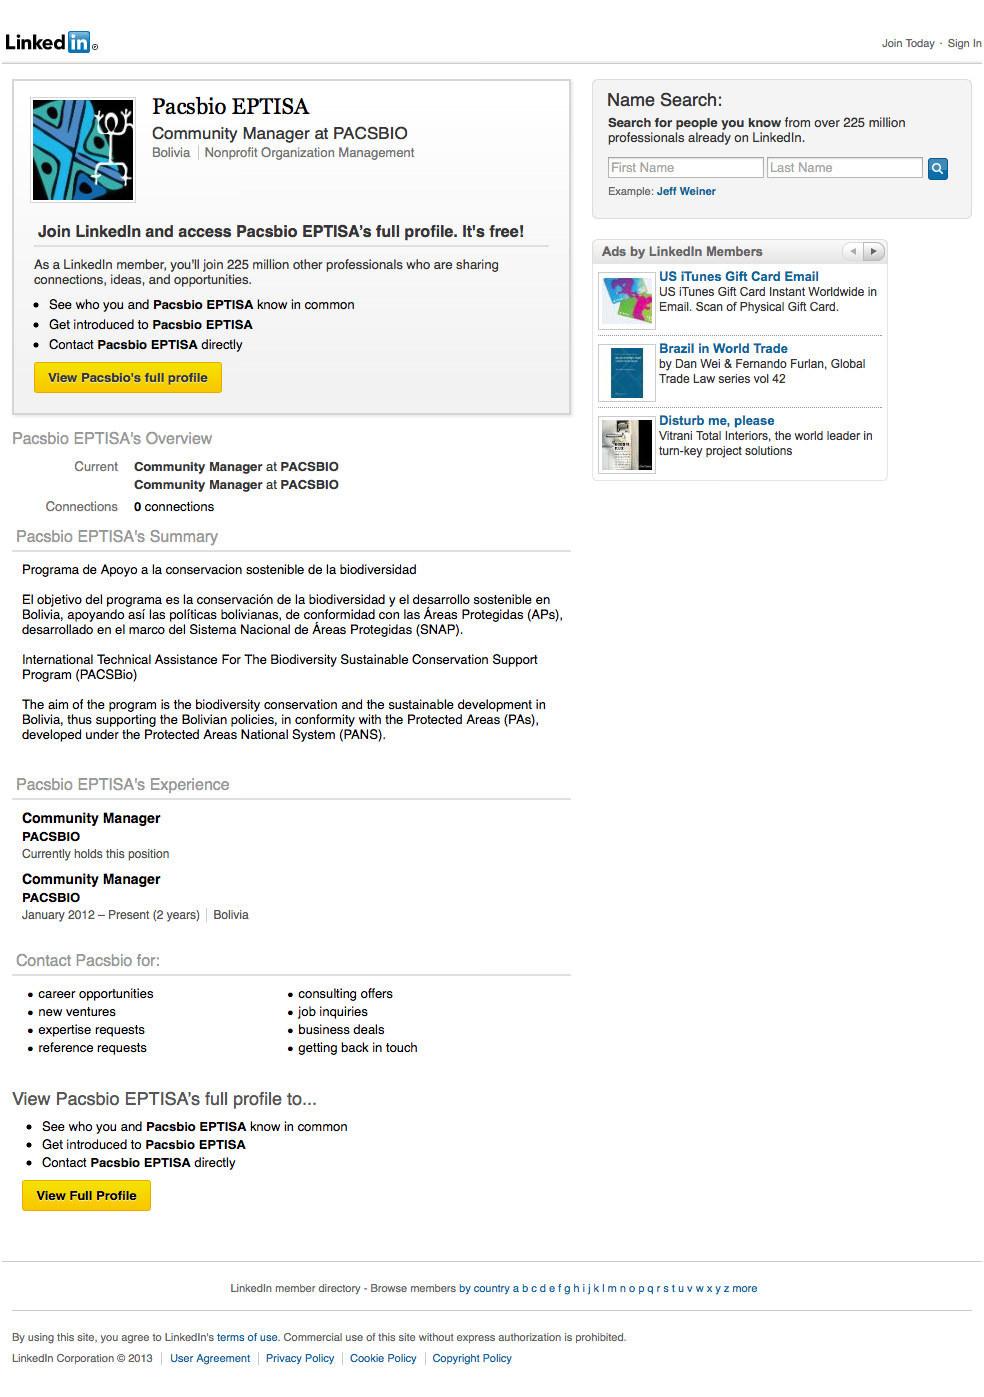 Pacsbio EPTISA | LinkedIn copy.jpg